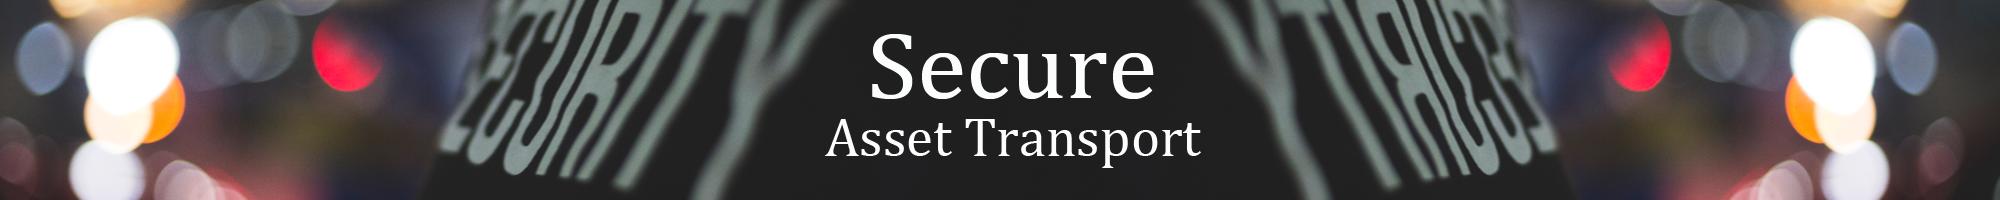 Secure Asset